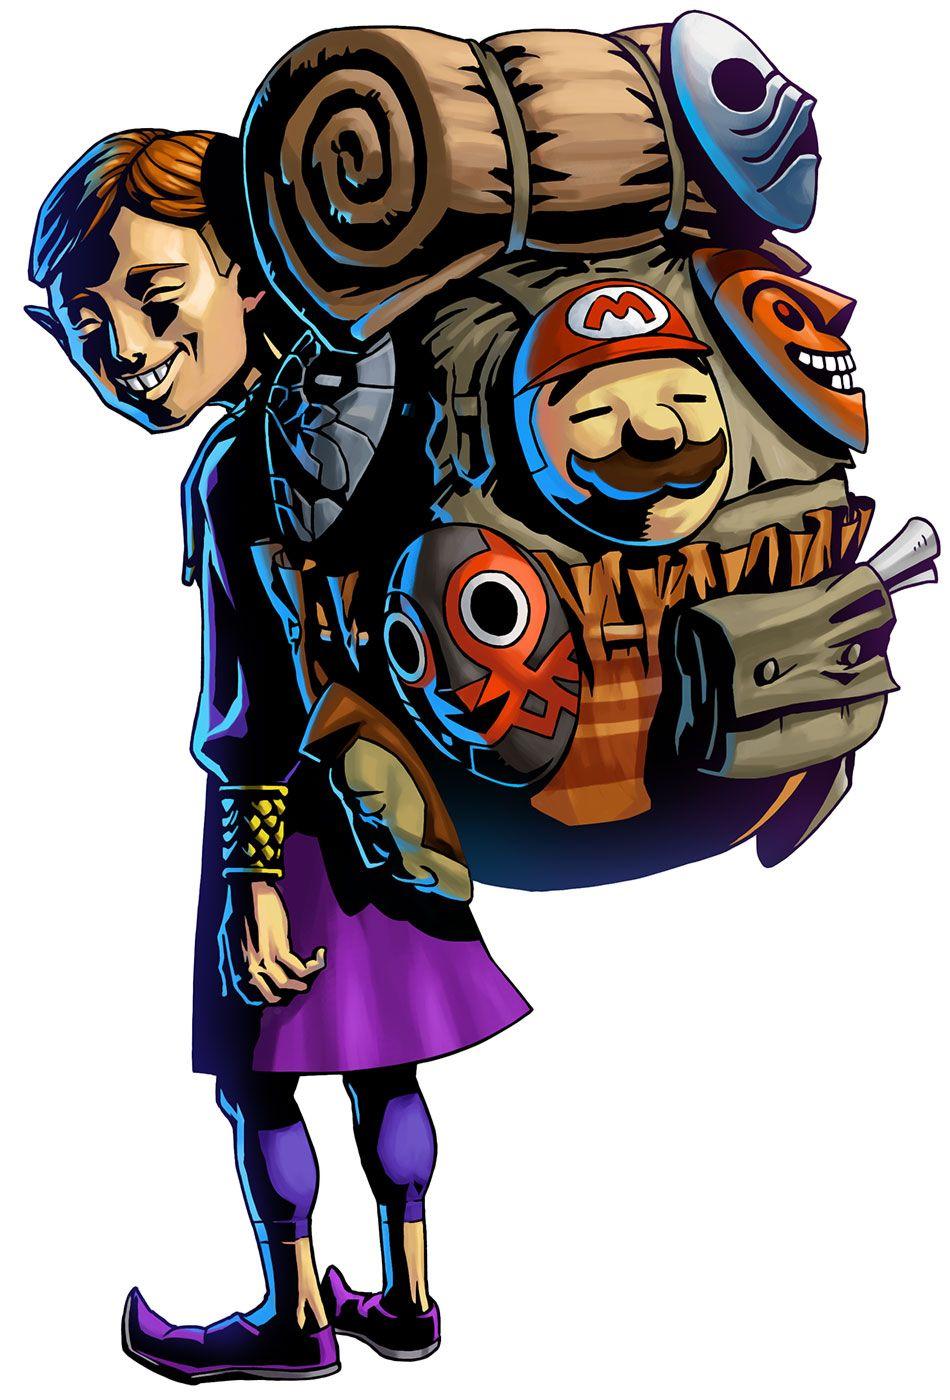 Happy Mask Salesman With Images Majoras Mask Art Zelda Art